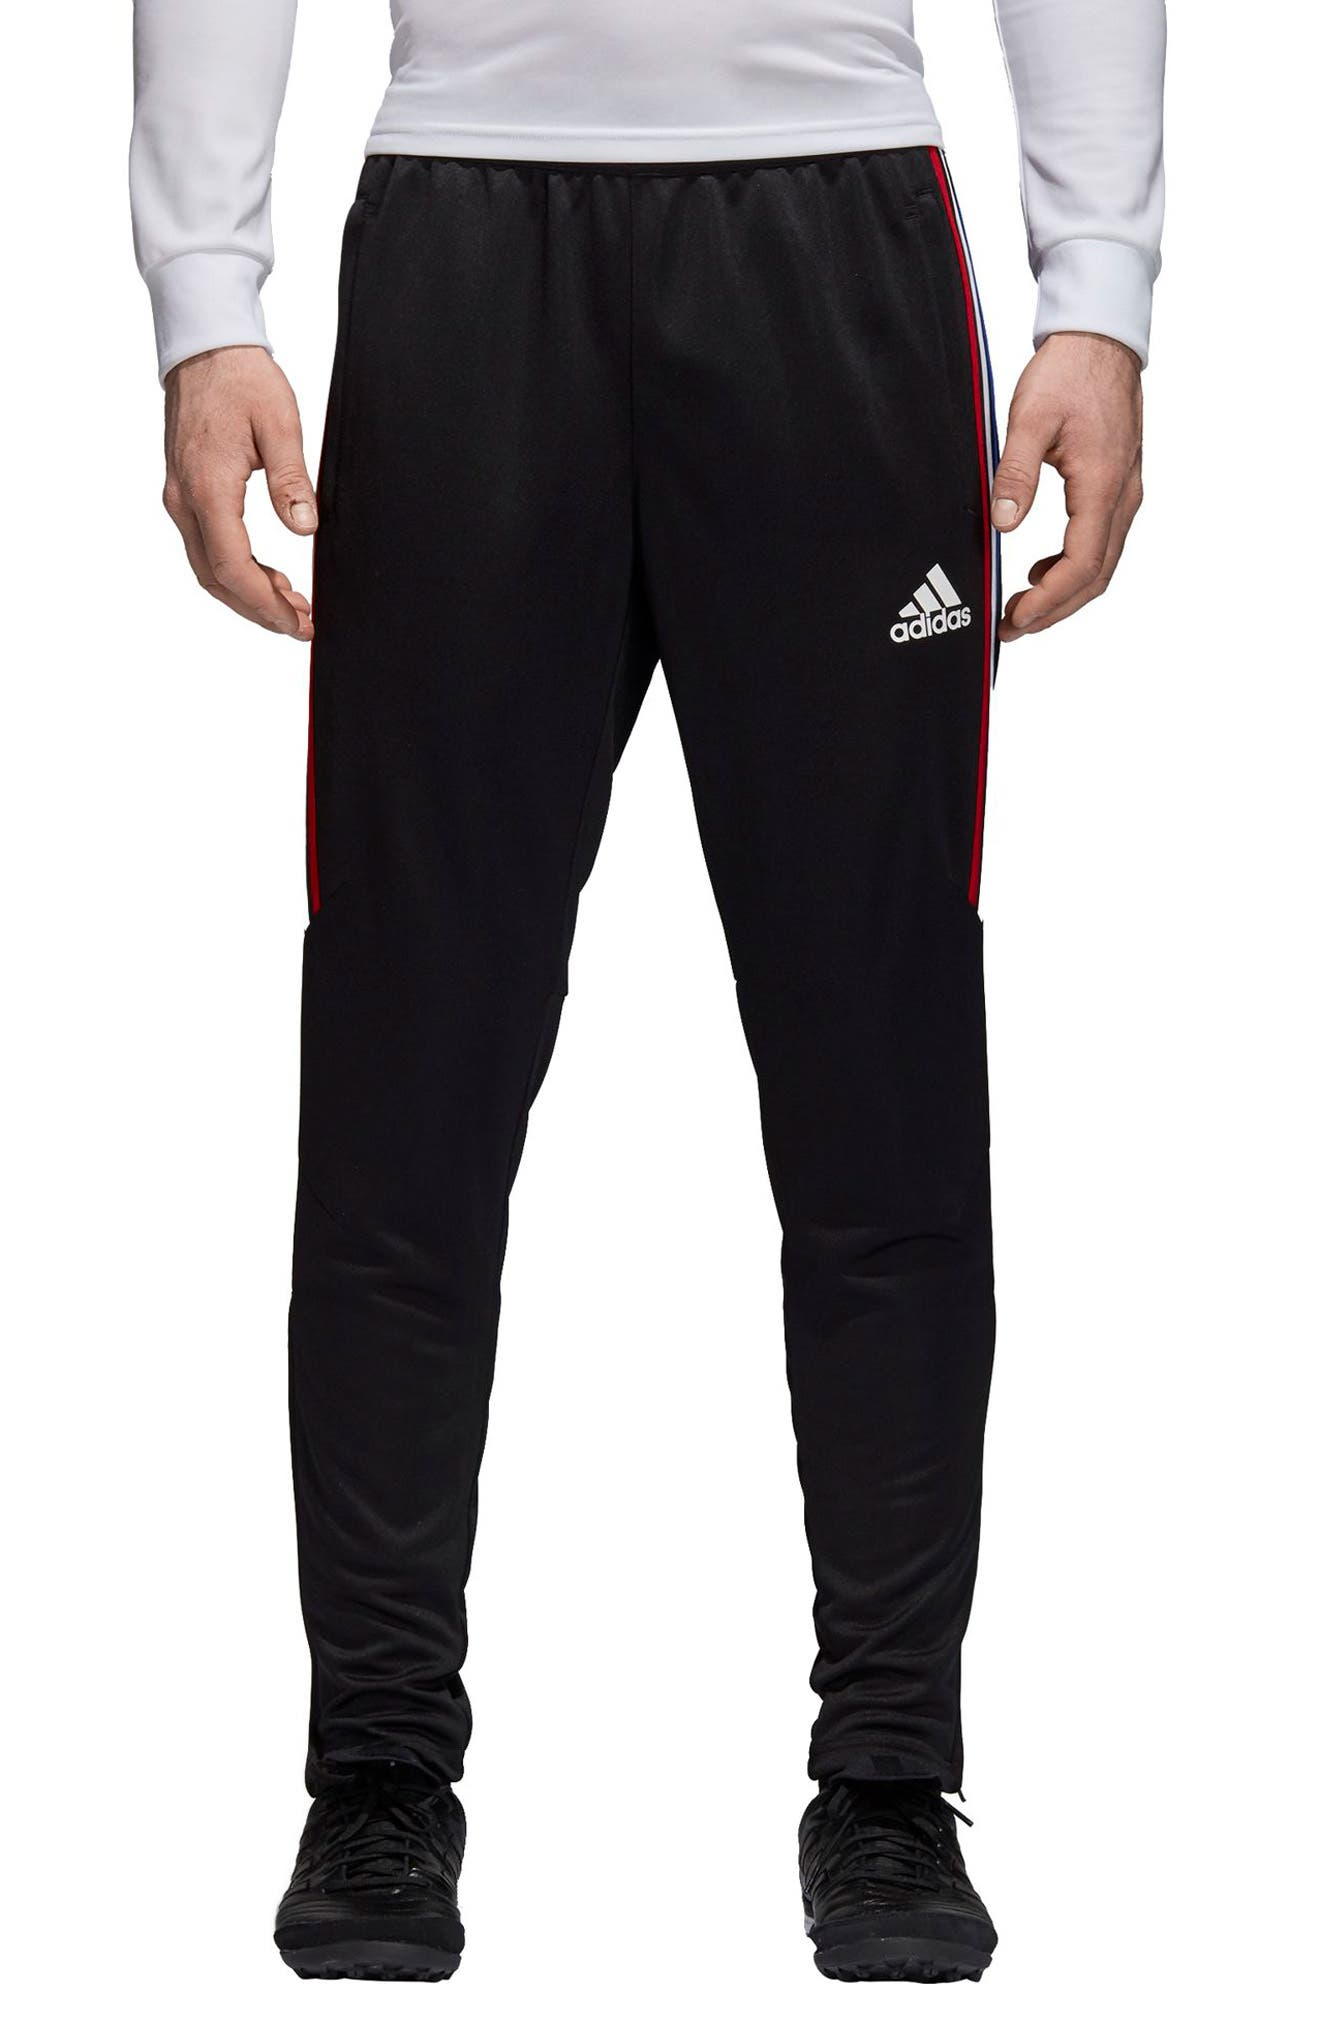 ADIDAS Tiro 17 Regular Fit Training Pants, Main, color, BLACK/ RED/ WHITE/ BLUE